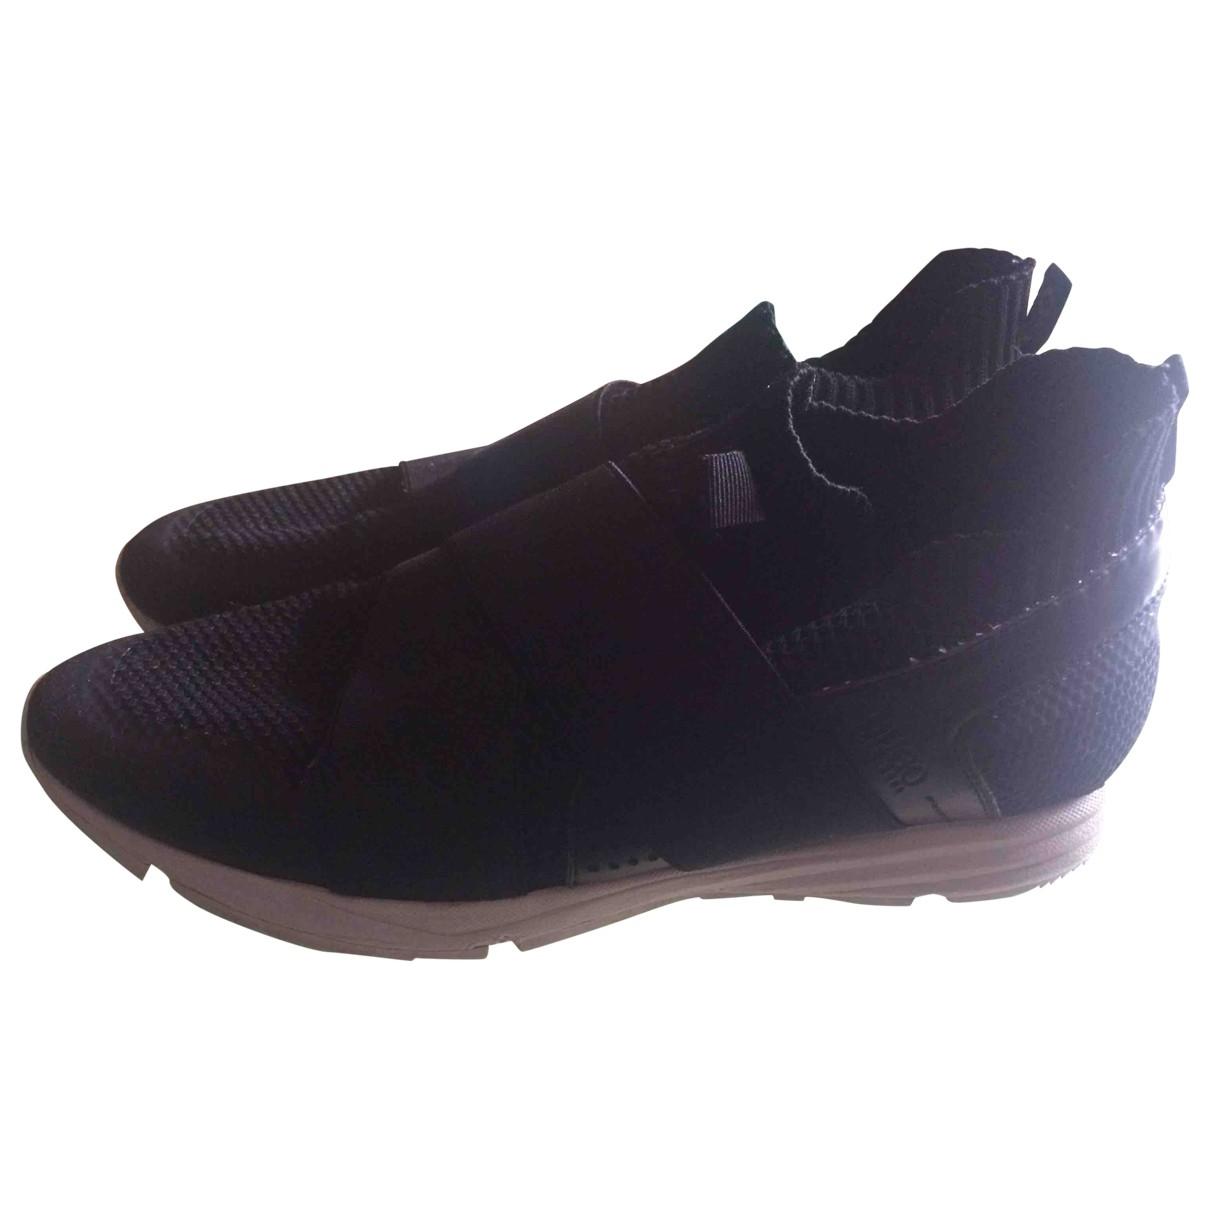 Hugo Boss \N Sneakers in  Schwarz Leinen